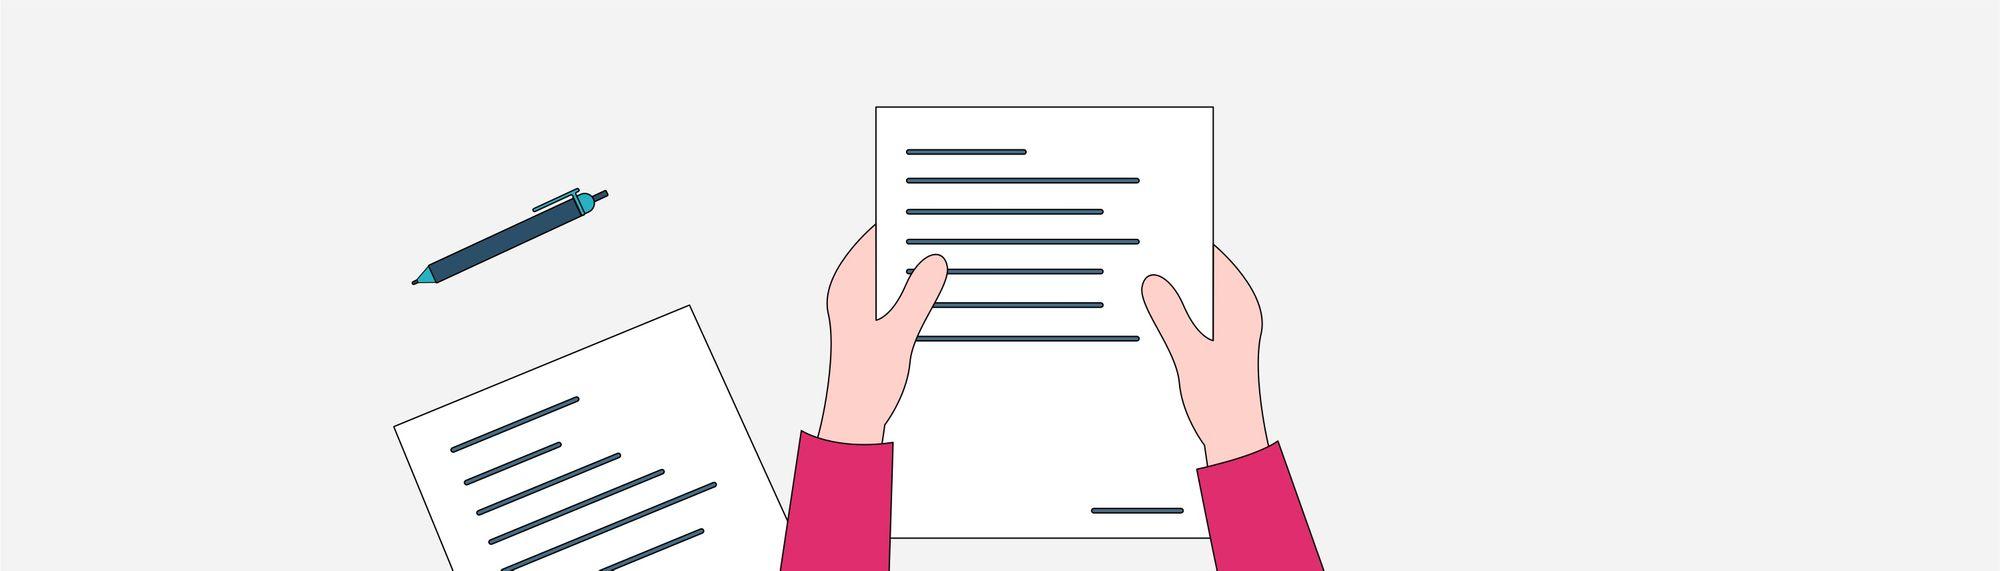 Manage HR paperwork digitally | MagicHire.co